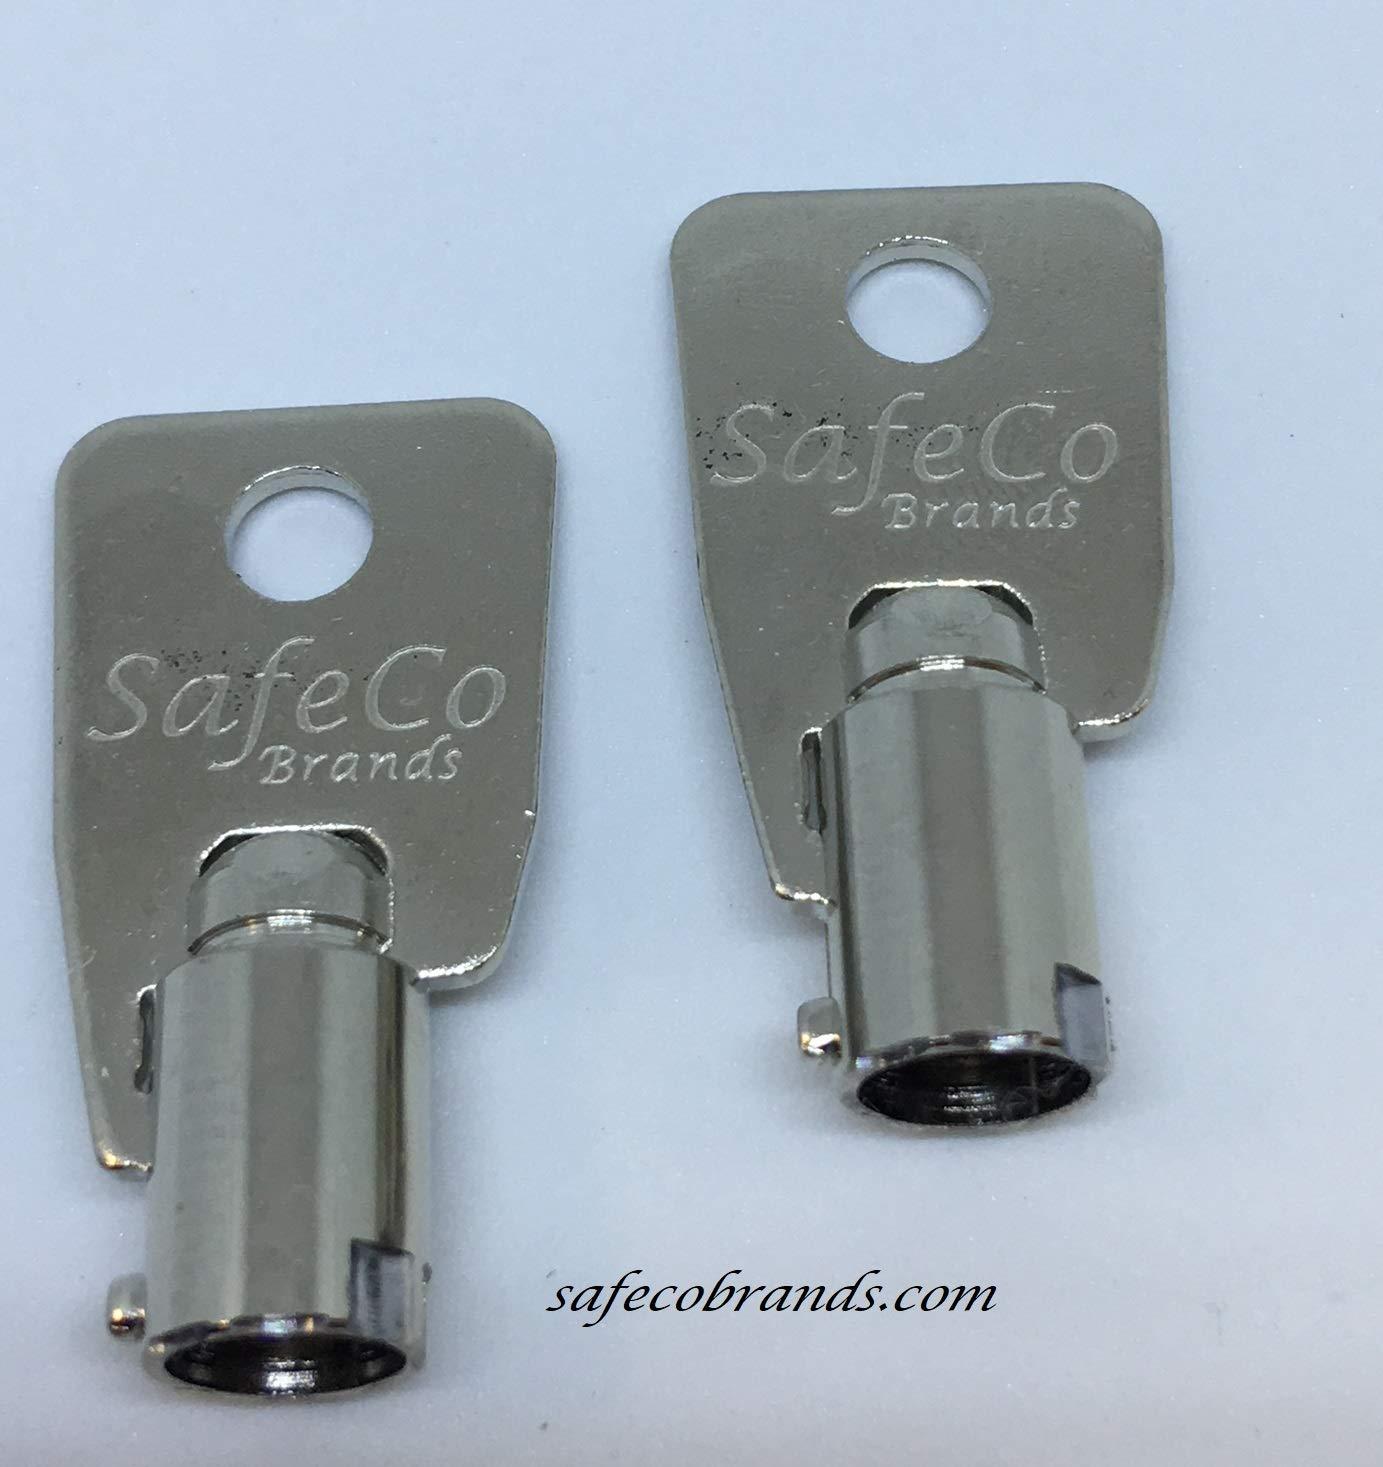 RVC Series Key Codes for Vending Machines, Locks, Switches 2-Keys (RVC204)